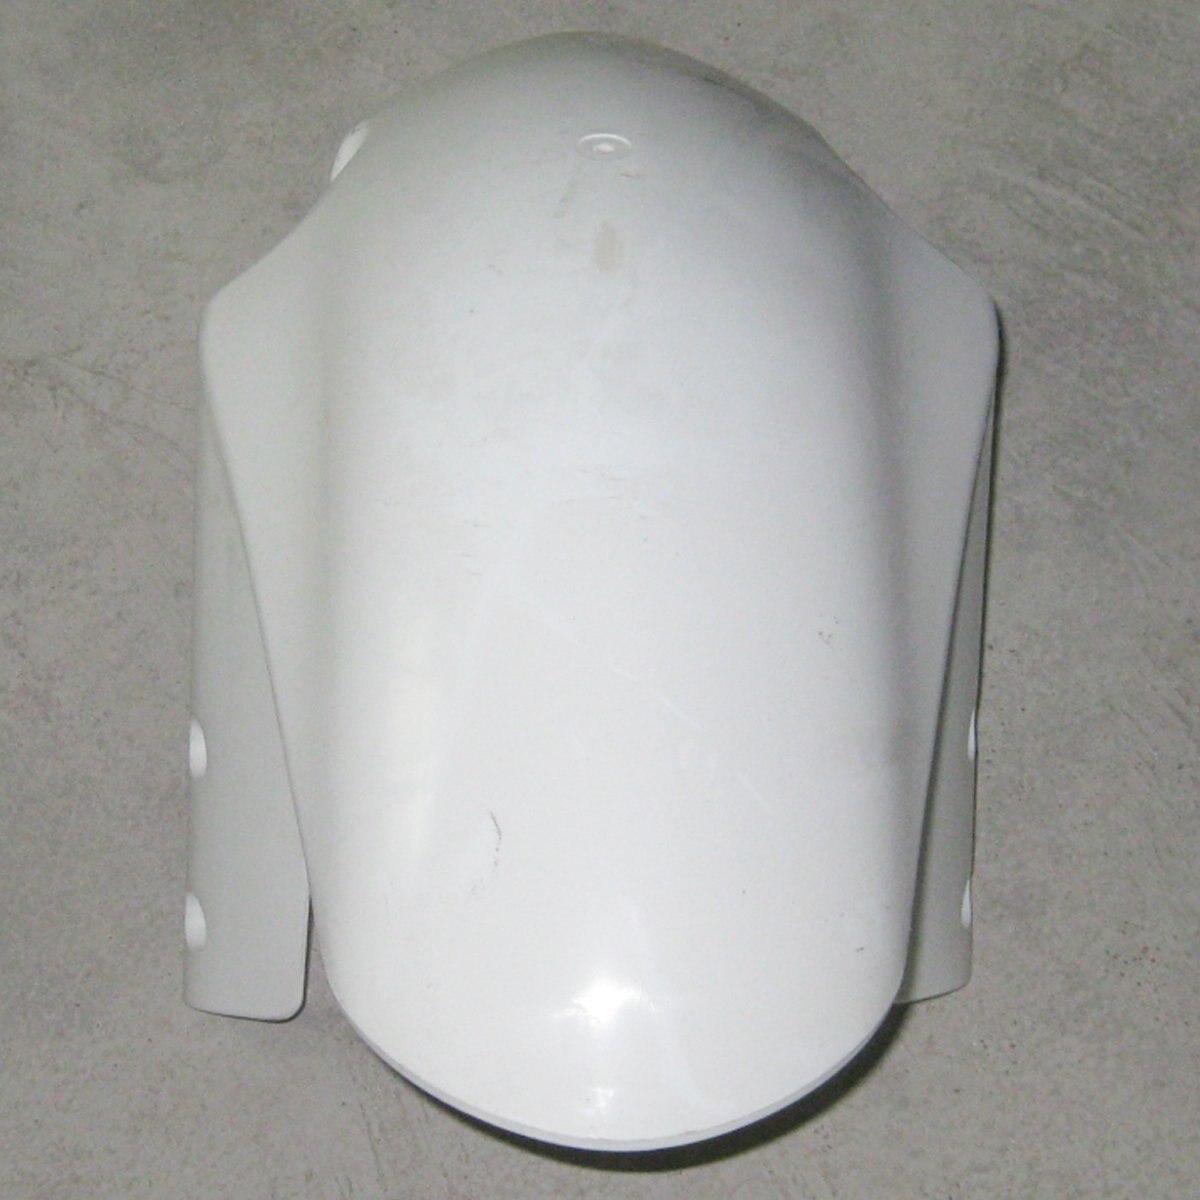 Обтекатель брызговика для мотоцикла, неокрашенный, передний, обтекатель брызговика, комплект для Suzuki GSXR1000, GSX-R, 1000, K1, 2001, 2002, GSXR, 1000, 01, 02, грязе...